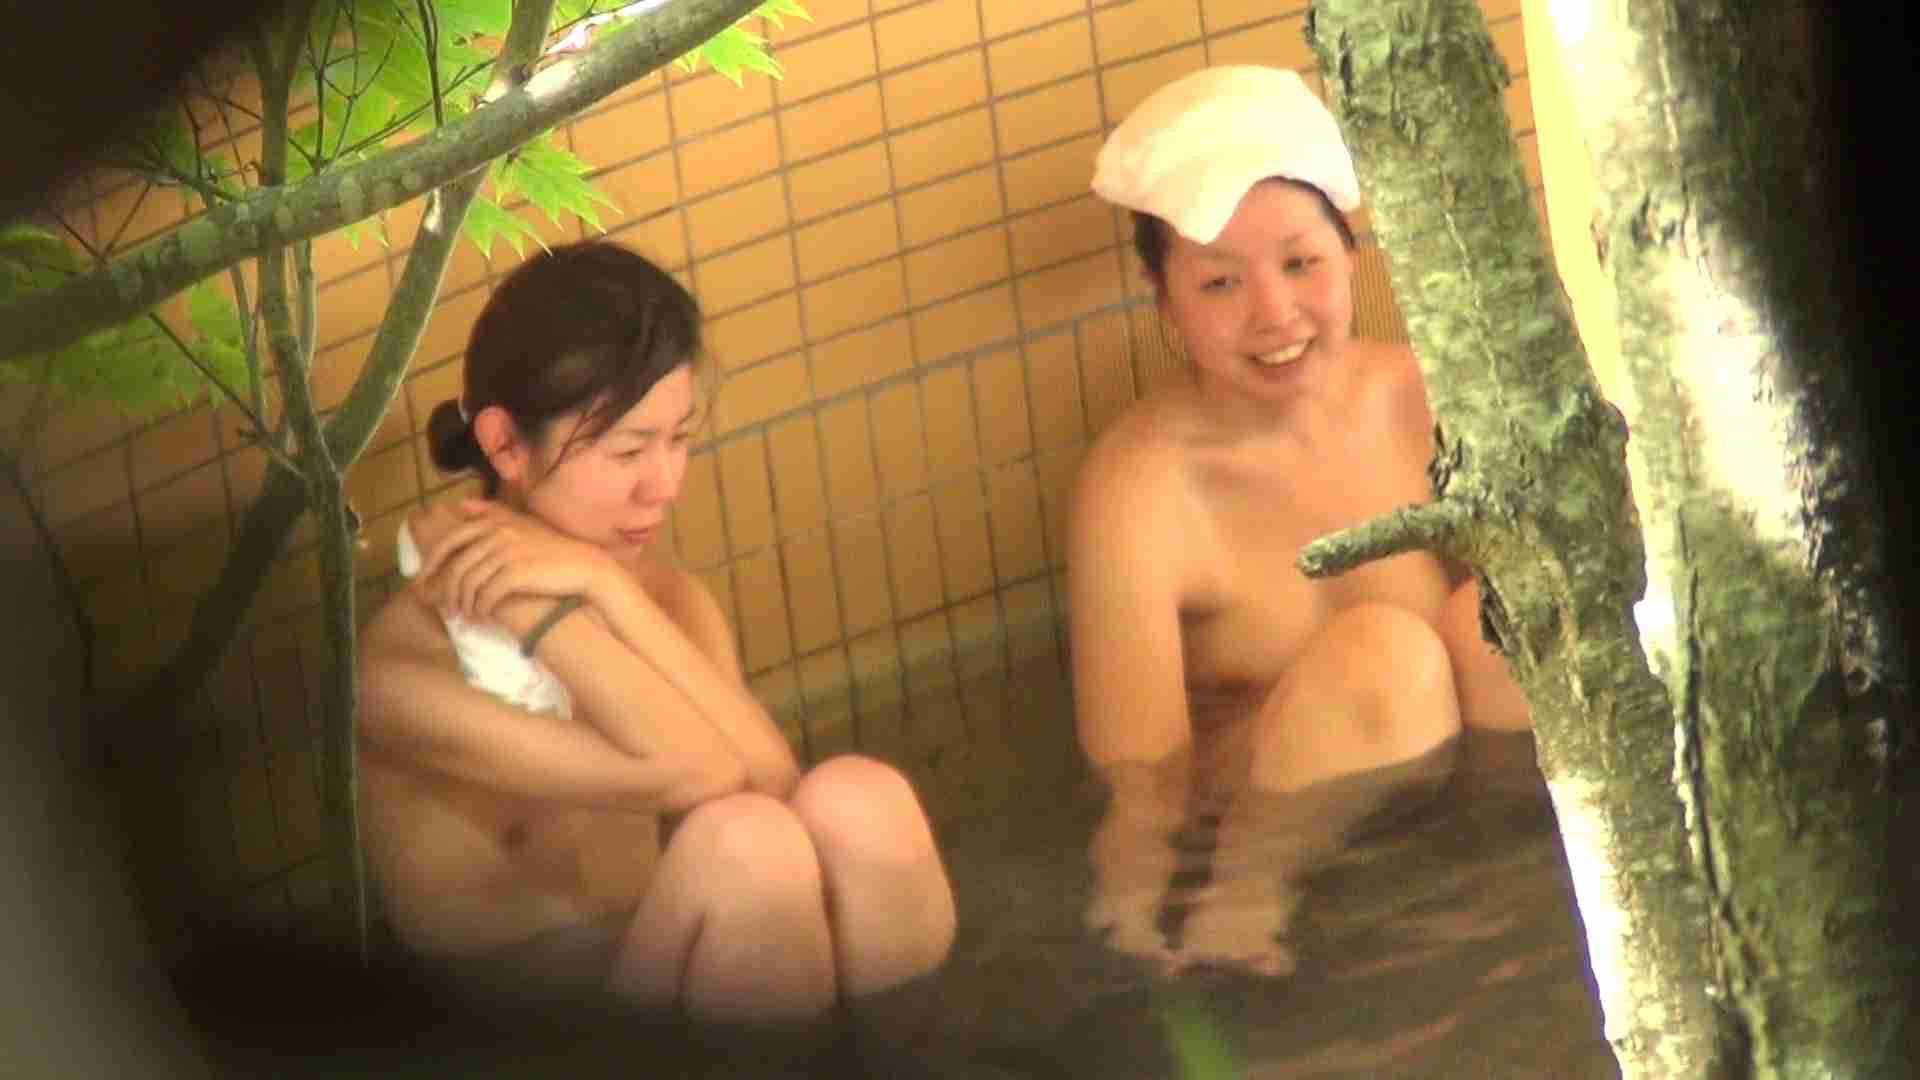 Vol.77 お上品な貧乳色白お女市さまの裸を見る醍醐味 美女 覗きオメコ動画キャプチャ 76pic 54